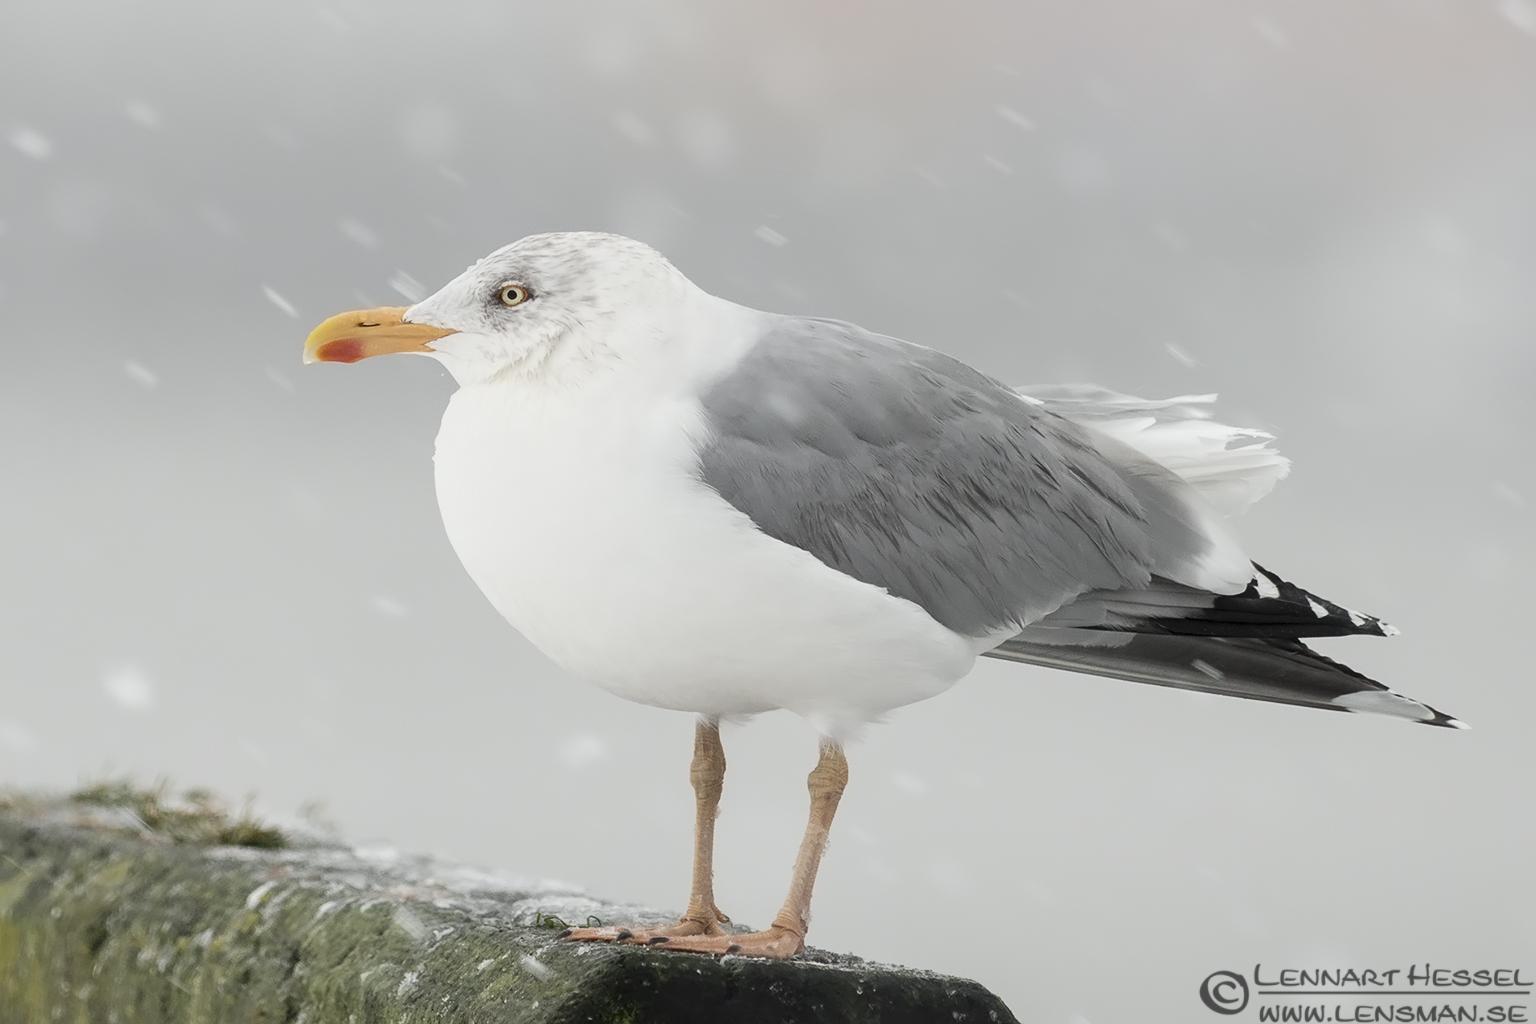 Adult European Herring Gull, winter photo from the Fish Harbor